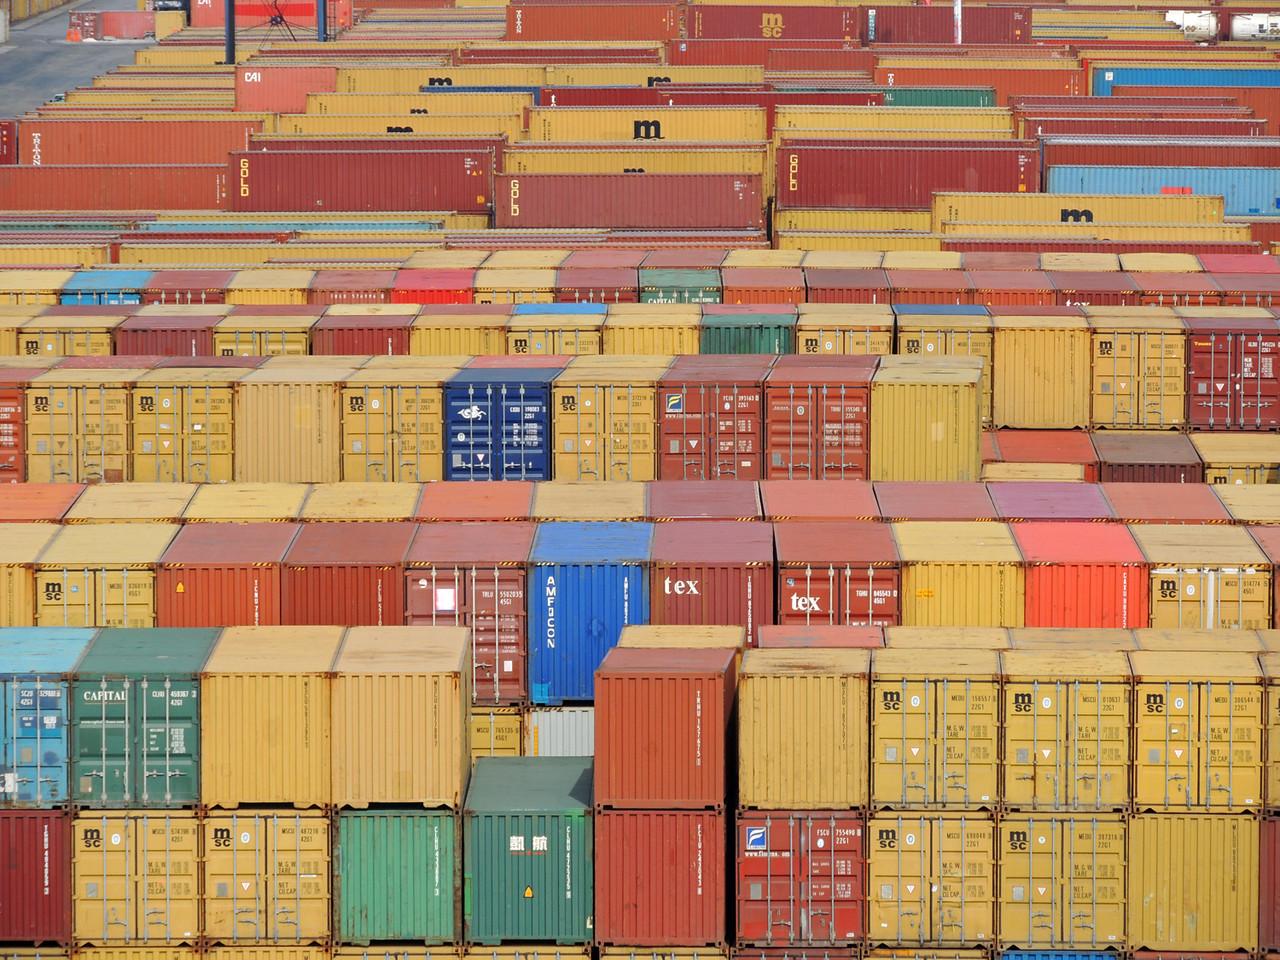 Freight waiting shipment